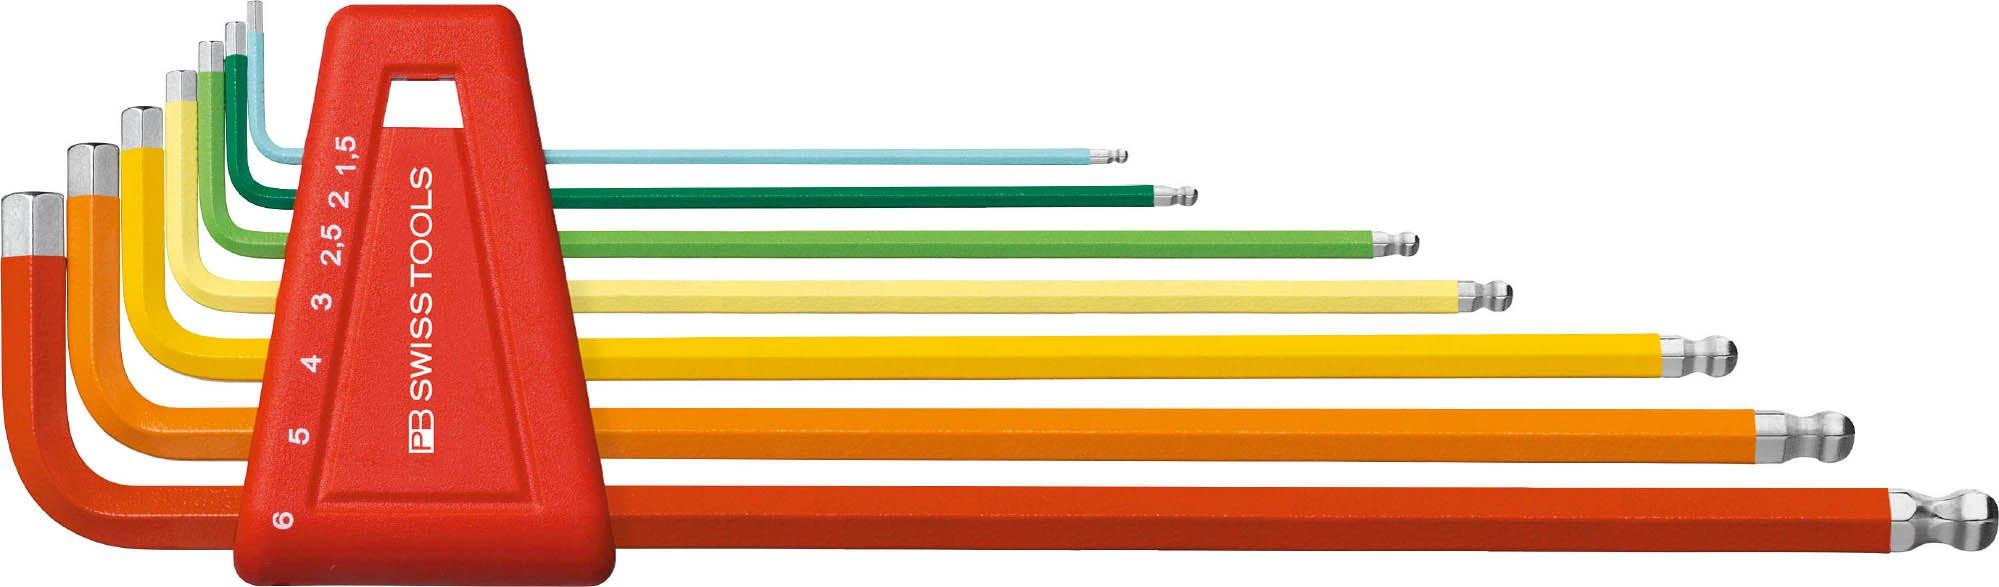 PB Swiss Tools PB 212LH-6 RB Ballend Hex Key Set long rainbow